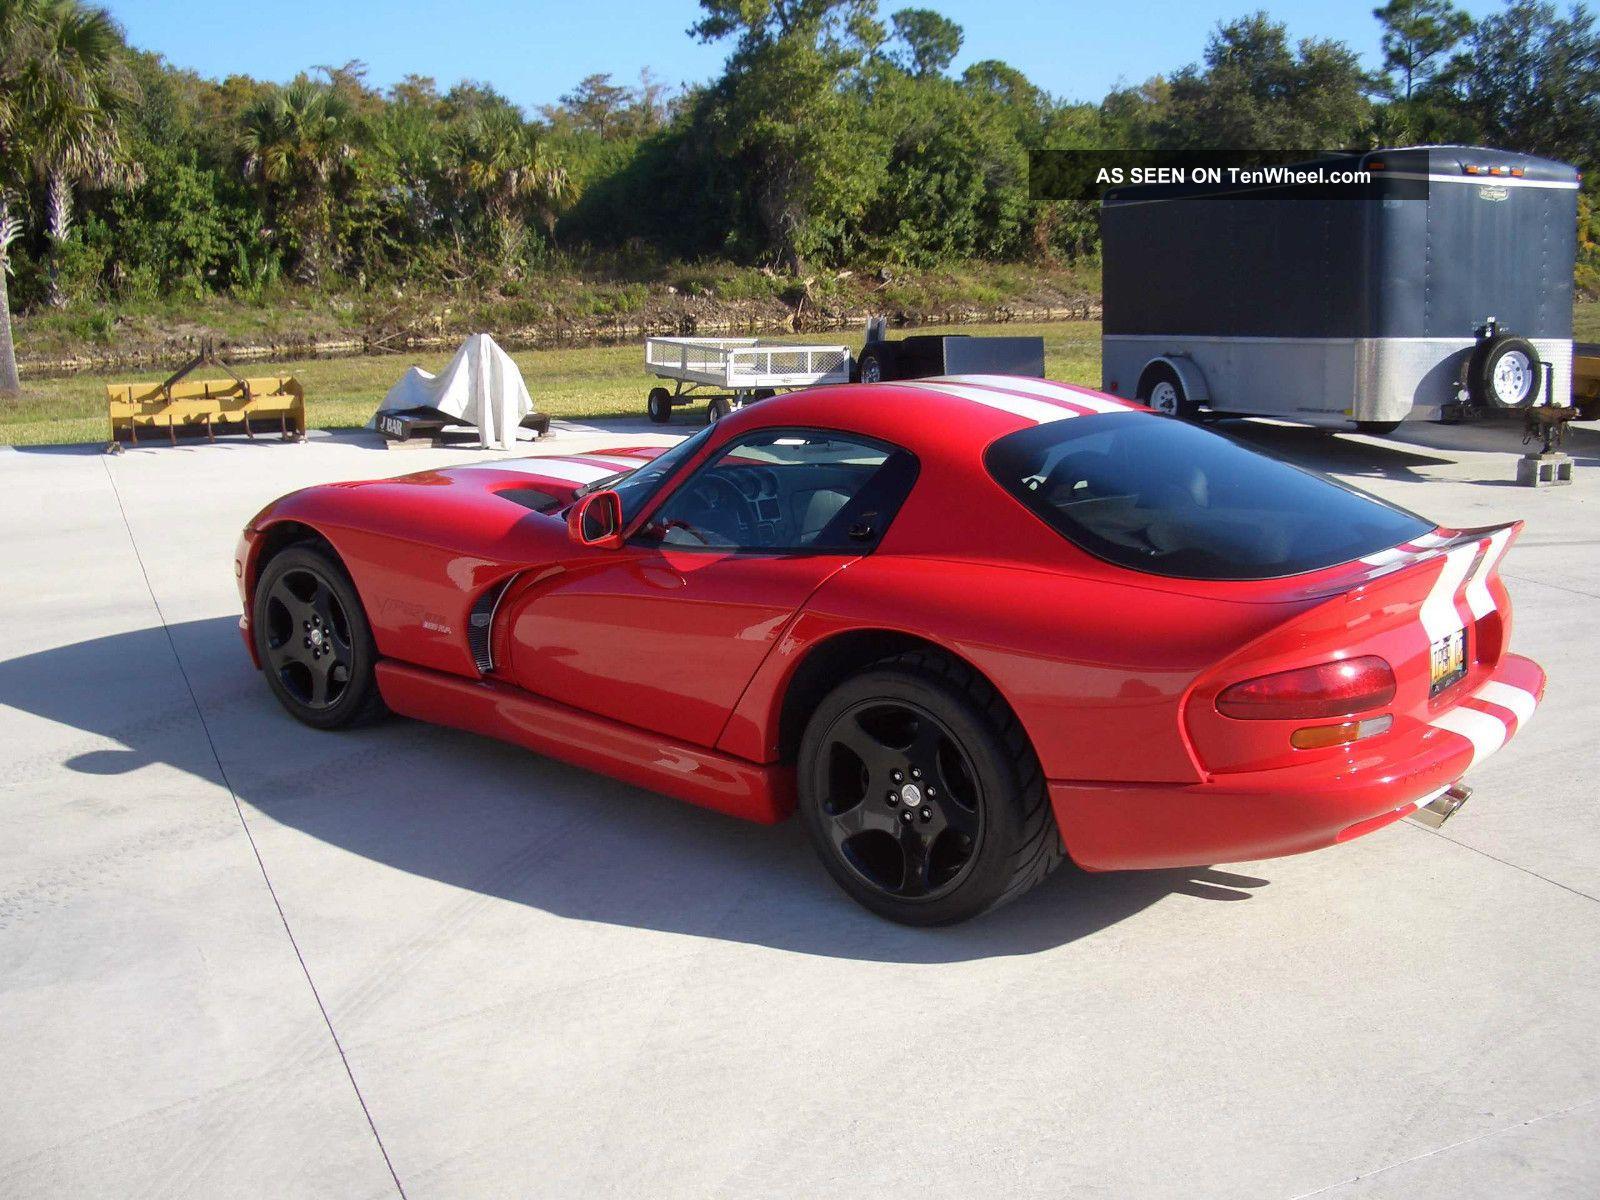 2002 Dodge Viper Gts Final Edition Belanger Headers,  Corsa Exhaust Viper photo